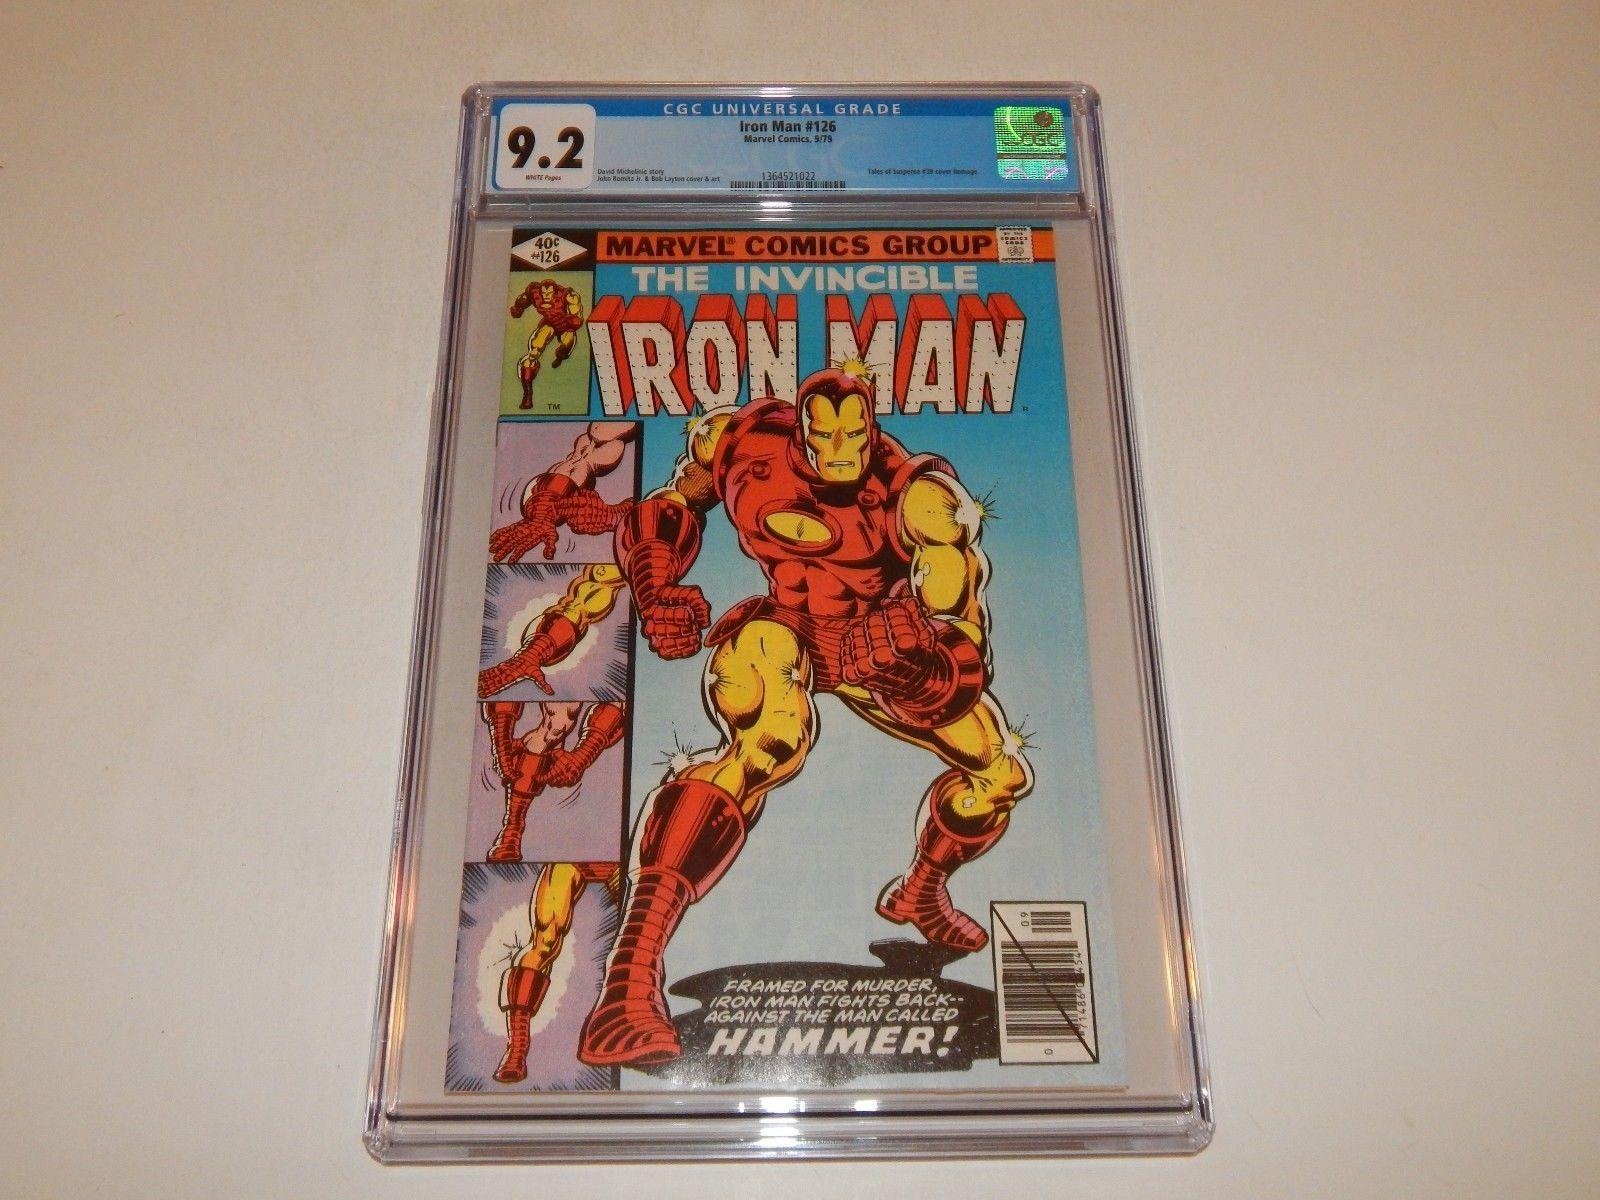 Iron Man #126  CGC 9.2..Classic Tony Stark Iron Man cover..Romita/Layton